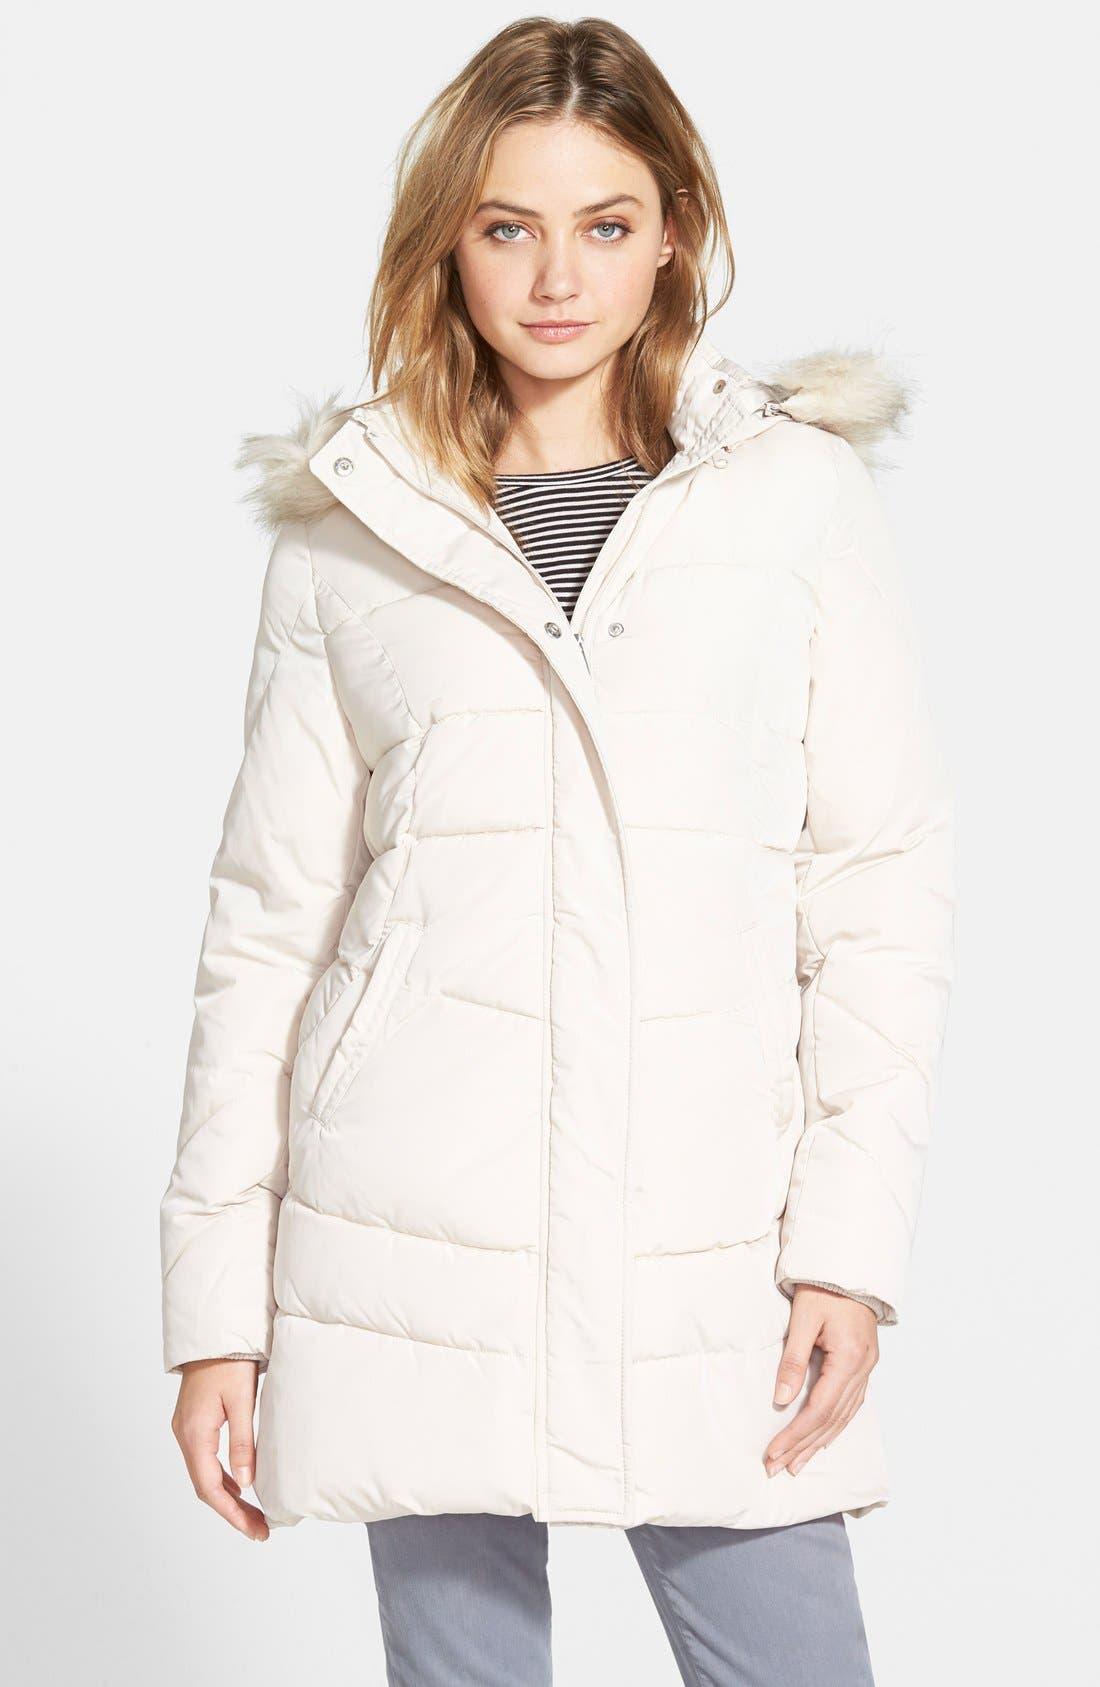 Alternate Image 1 Selected - Steve Madden Faux Fur Trim Hooded Quilted Coat